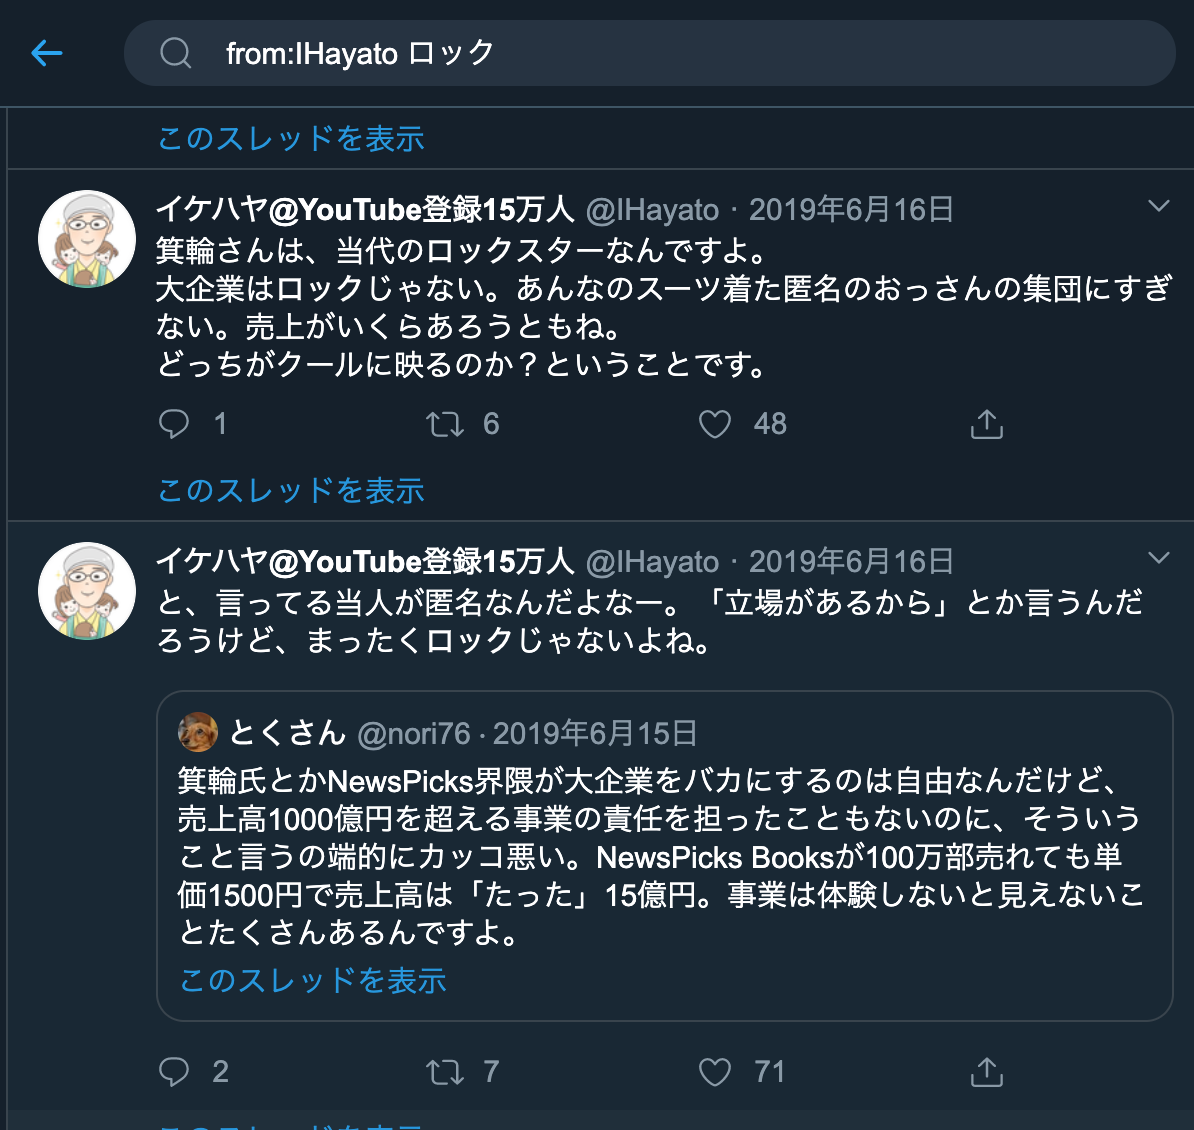 f:id:hideyoshi1537:20200224221910p:plain